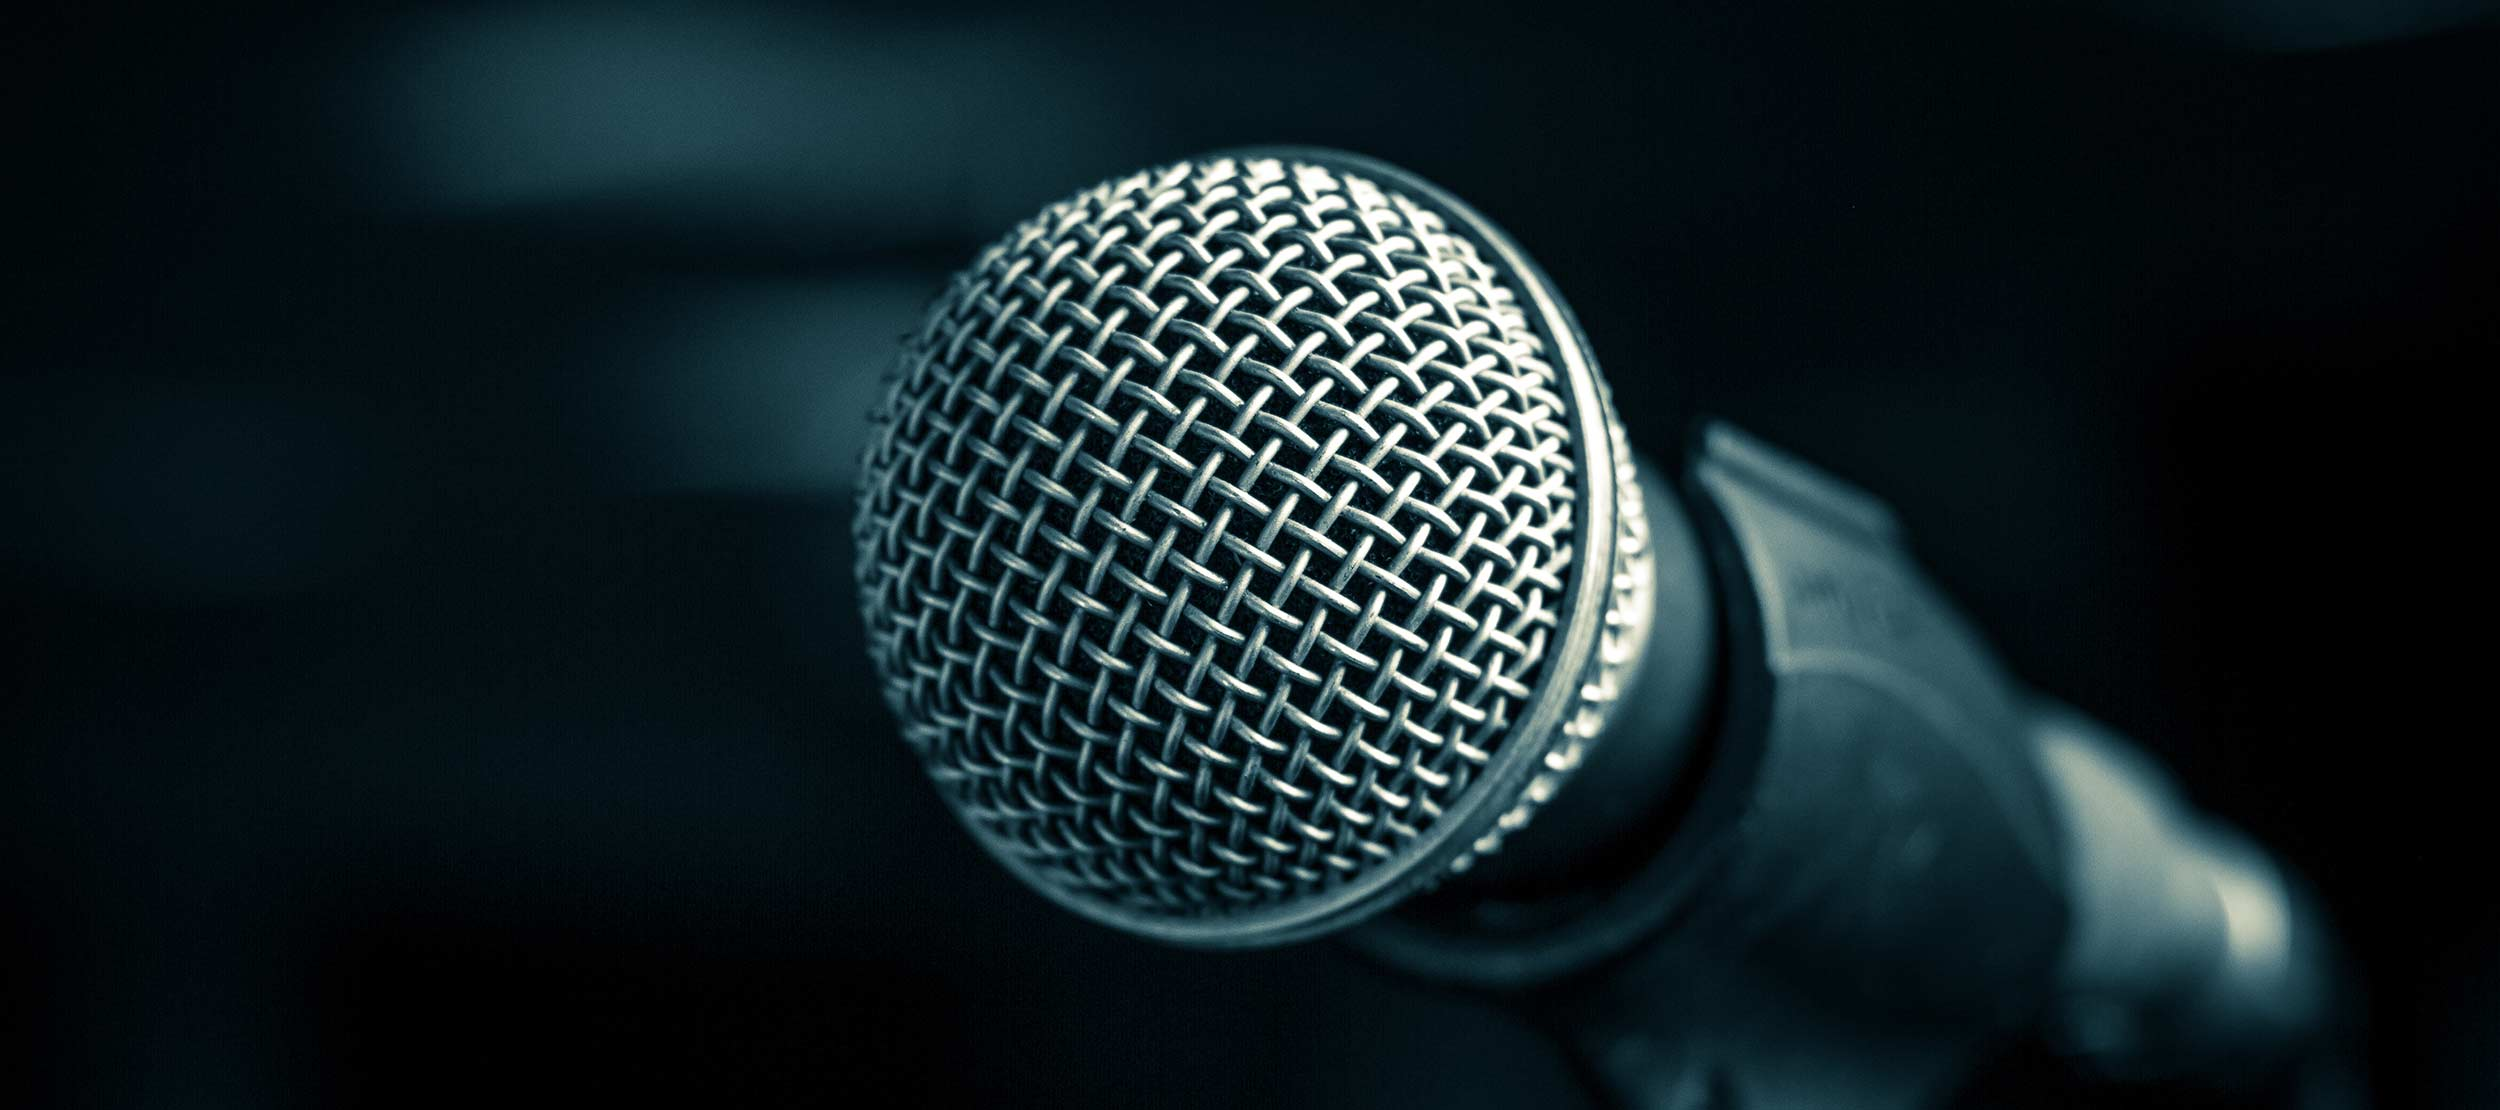 Wea re Noisy - Marketing services